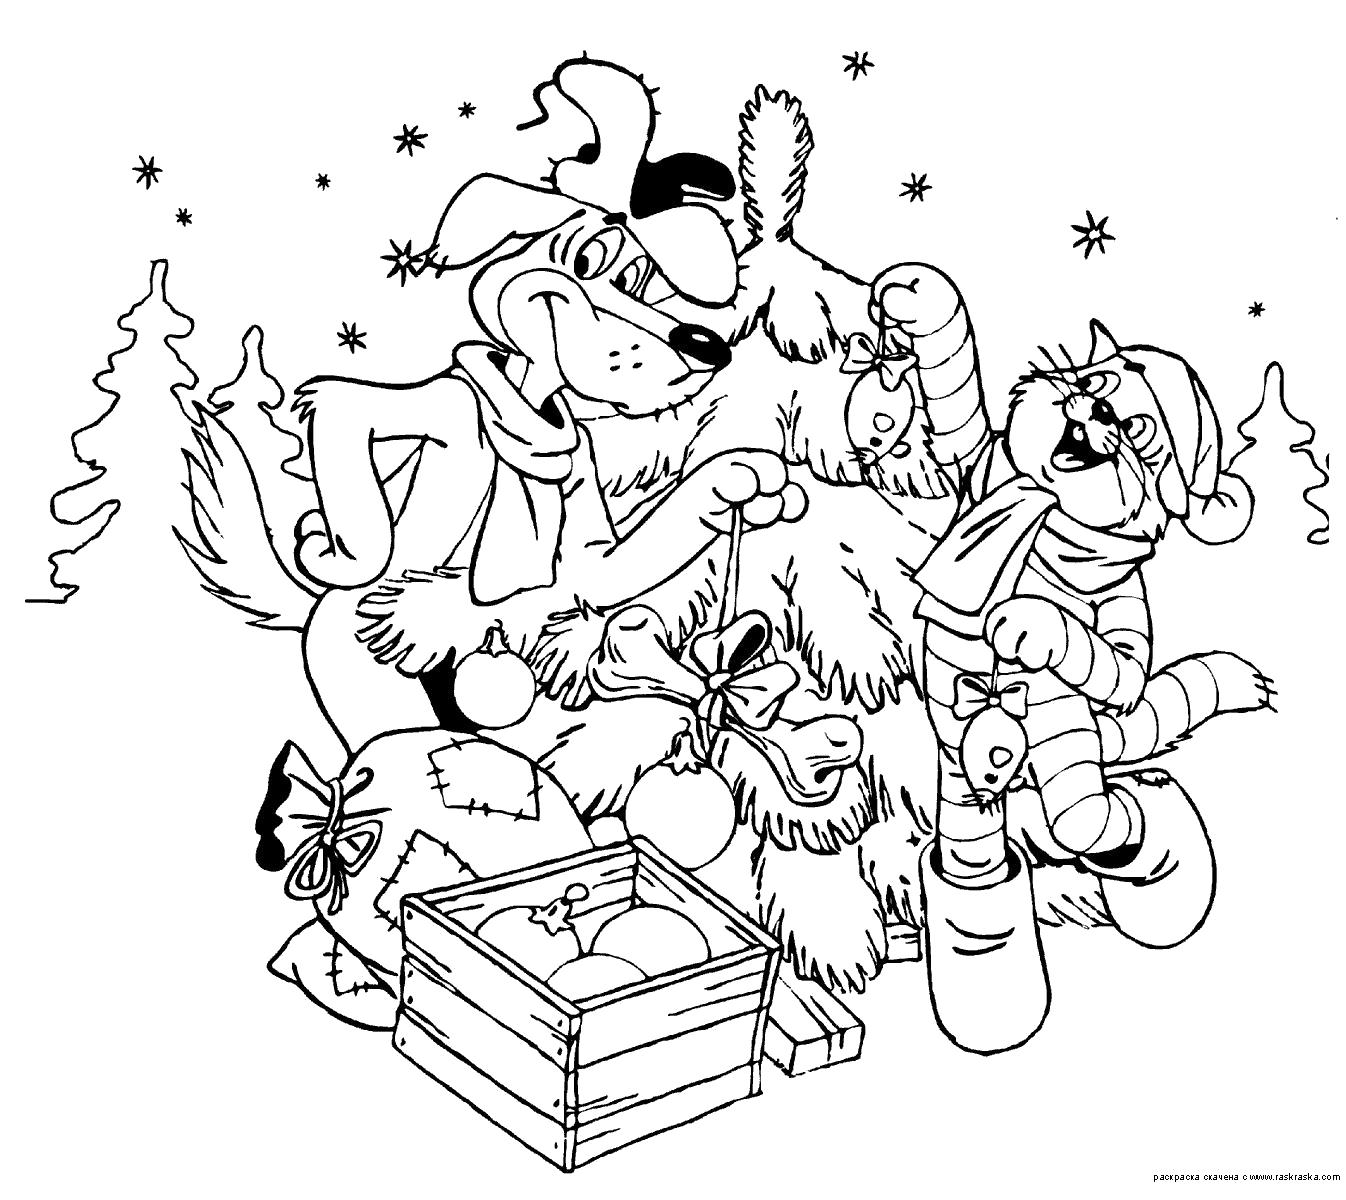 Раскраска Кот Матроскин и Собака Шарик наряжают Елку. Простоквашино